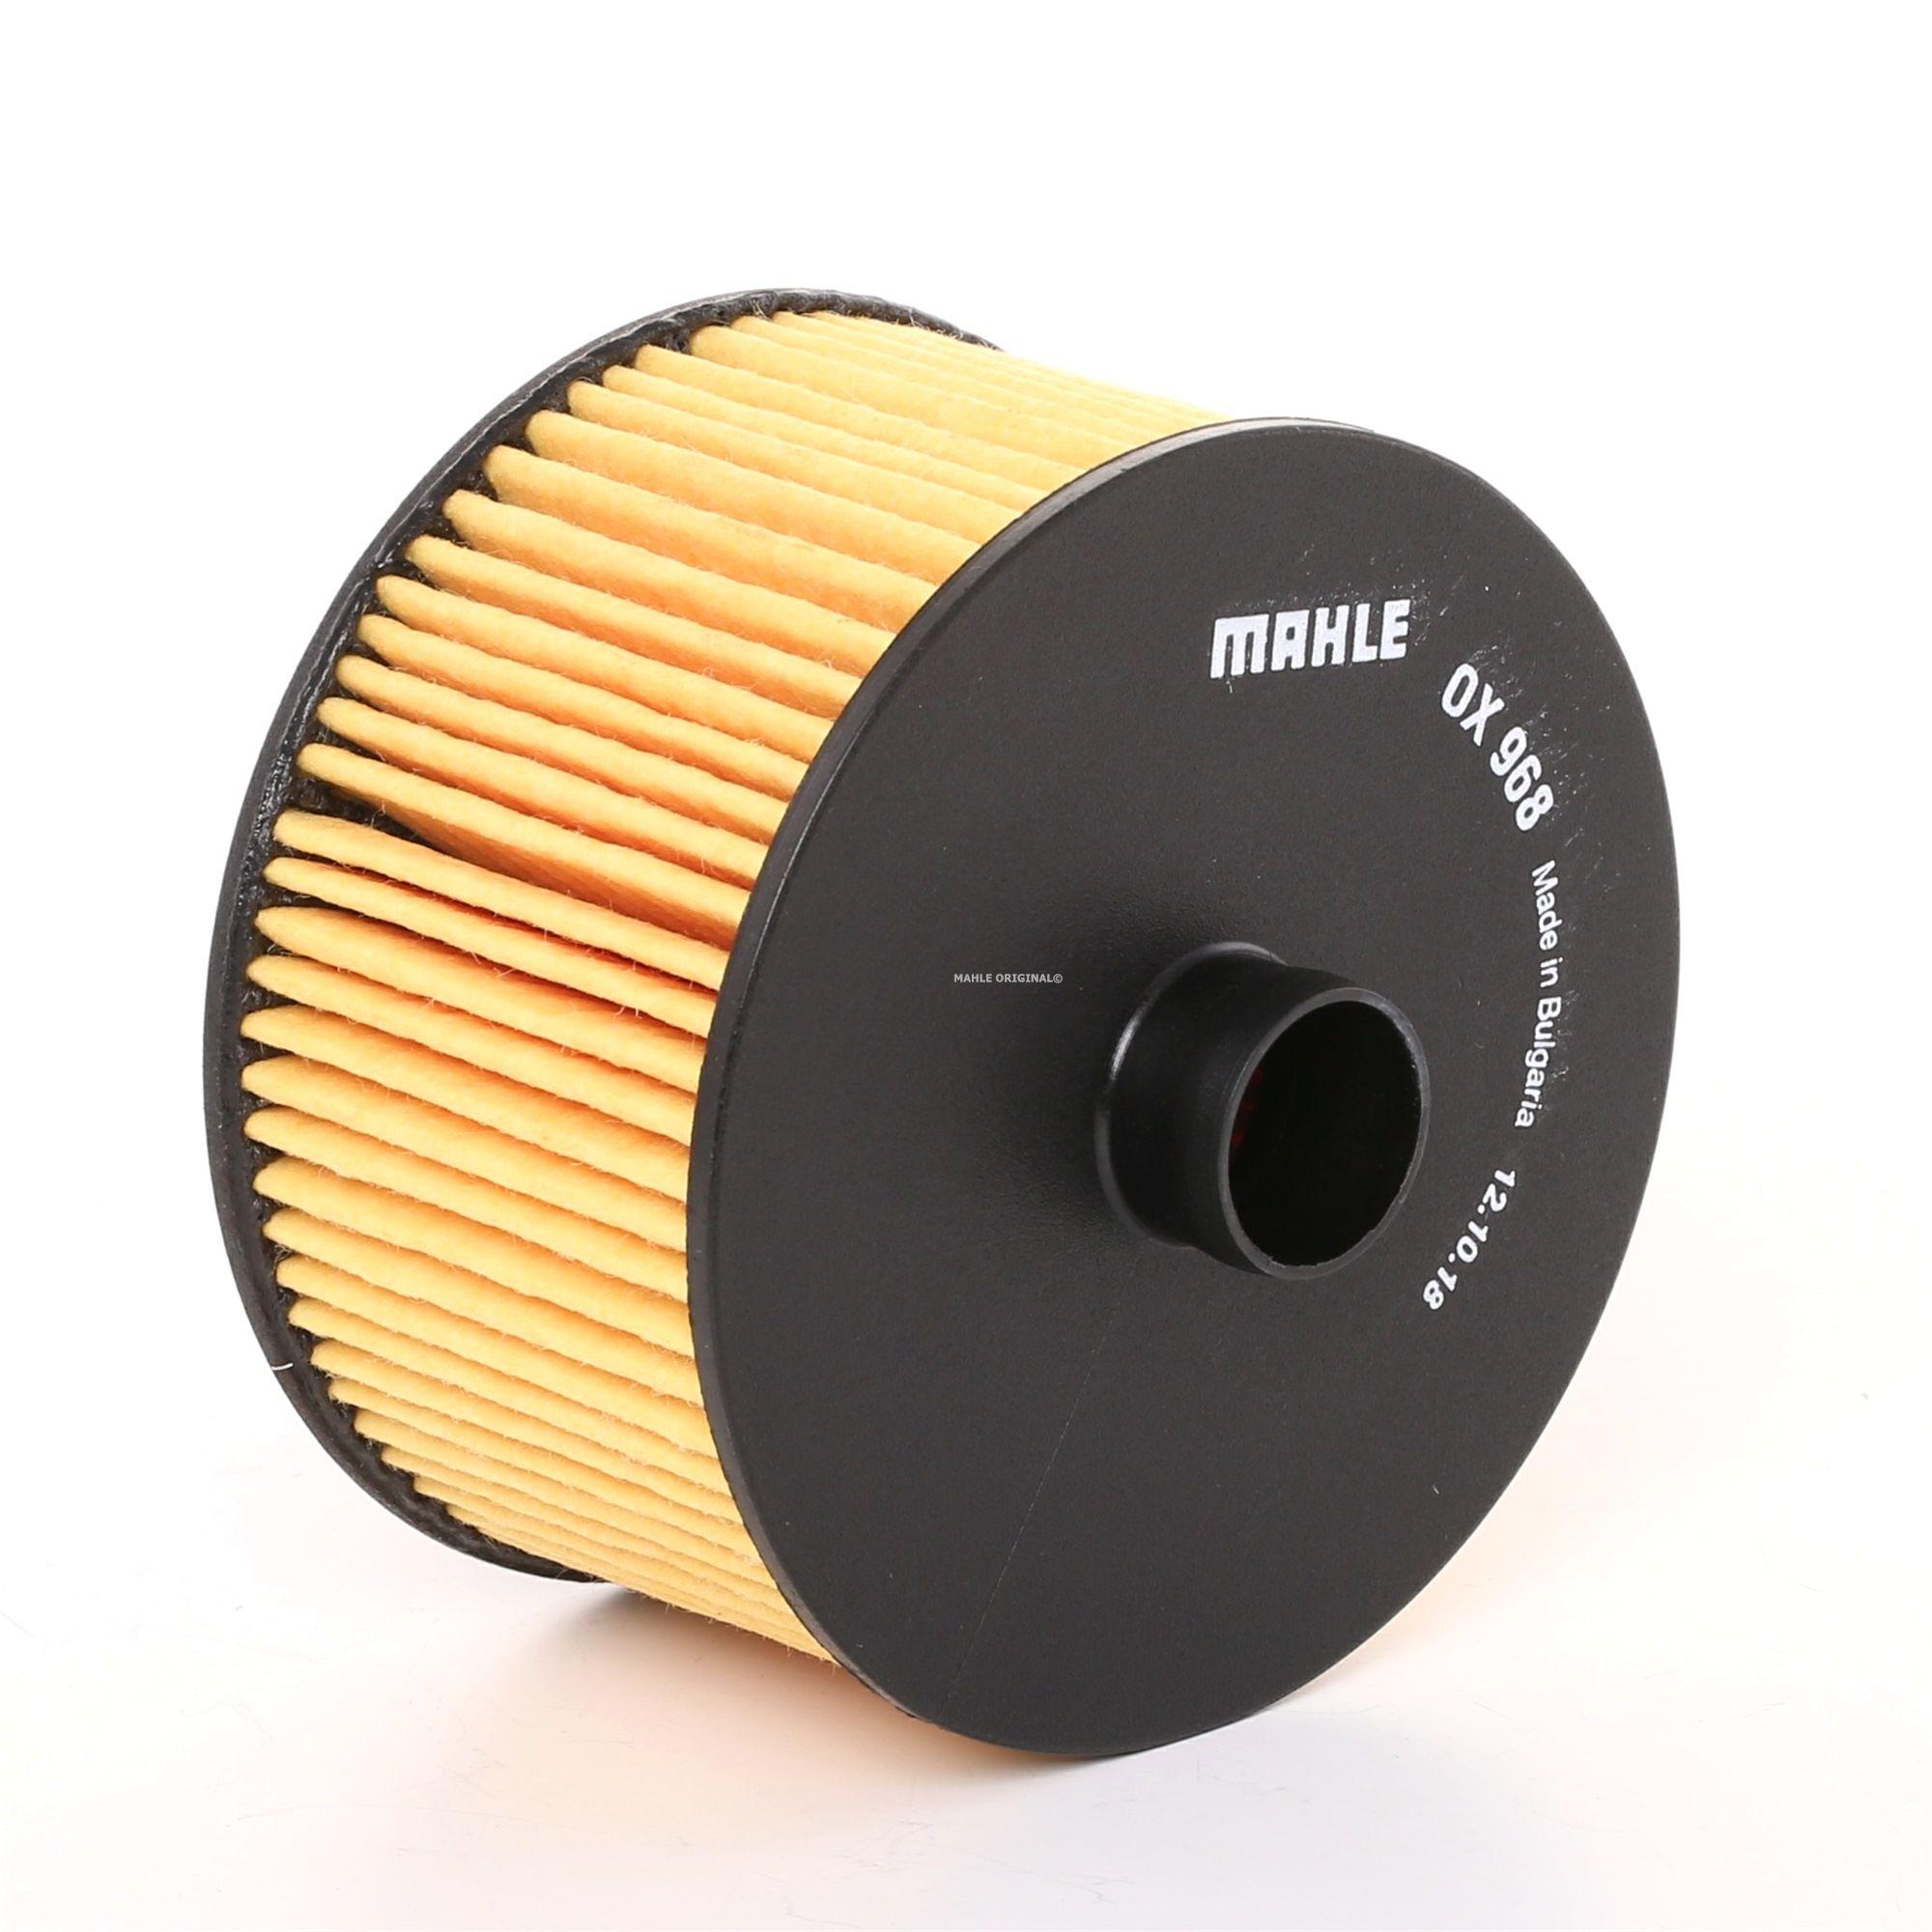 MAHLE ORIGINAL: Original Ölfilter OX 968D (Innendurchmesser 2: 21mm, Innendurchmesser 2: 21mm, Ø: 91,5mm, Ø: 91,5mm, Höhe: 63mm, Höhe 1: 52mm)